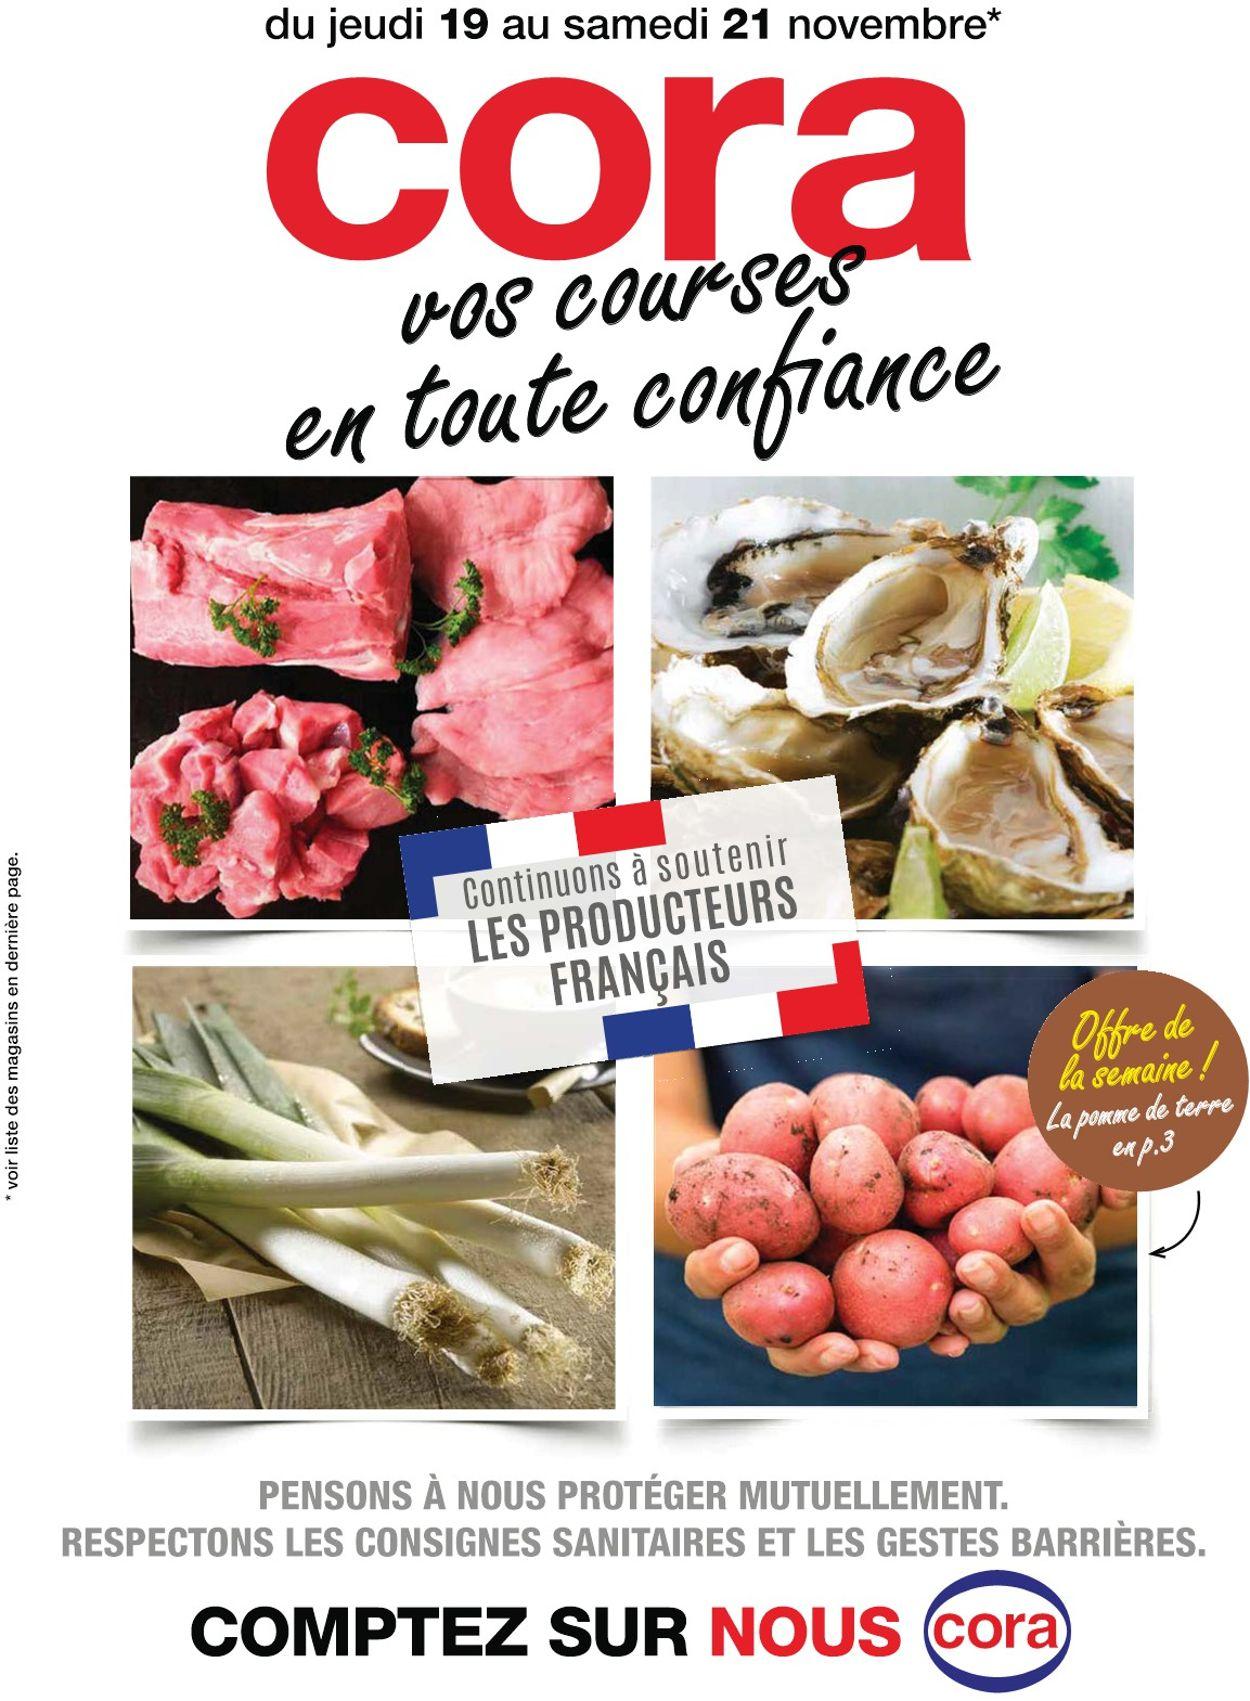 Cora Catalogue - 19.11-21.11.2020